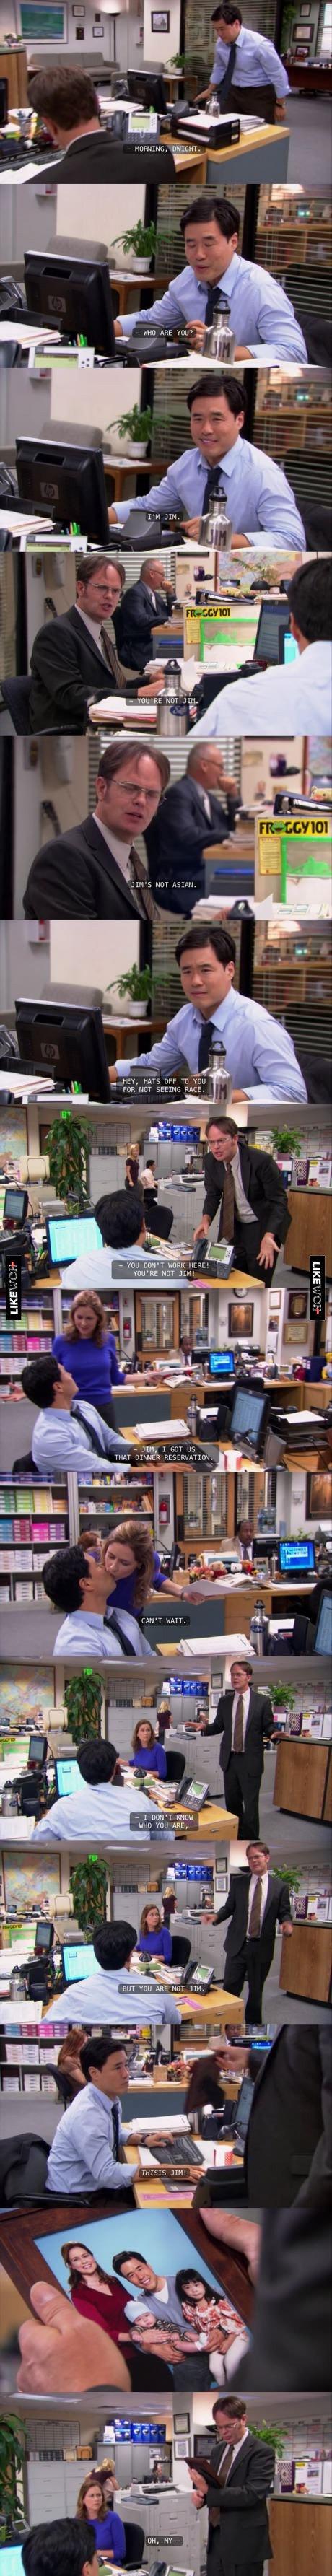 Jim. source: The Office. ree. tiill' q HEY, rais -EFF ili FOR NOT SCEEN I ilgili' it If TOO tatl' T Hanna Hm? , 5 Jim source: The Office ree tiill' q HEY rais -EFF ili FOR NOT SCEEN I ilgili' it If TOO tatl' T Hanna Hm? 5